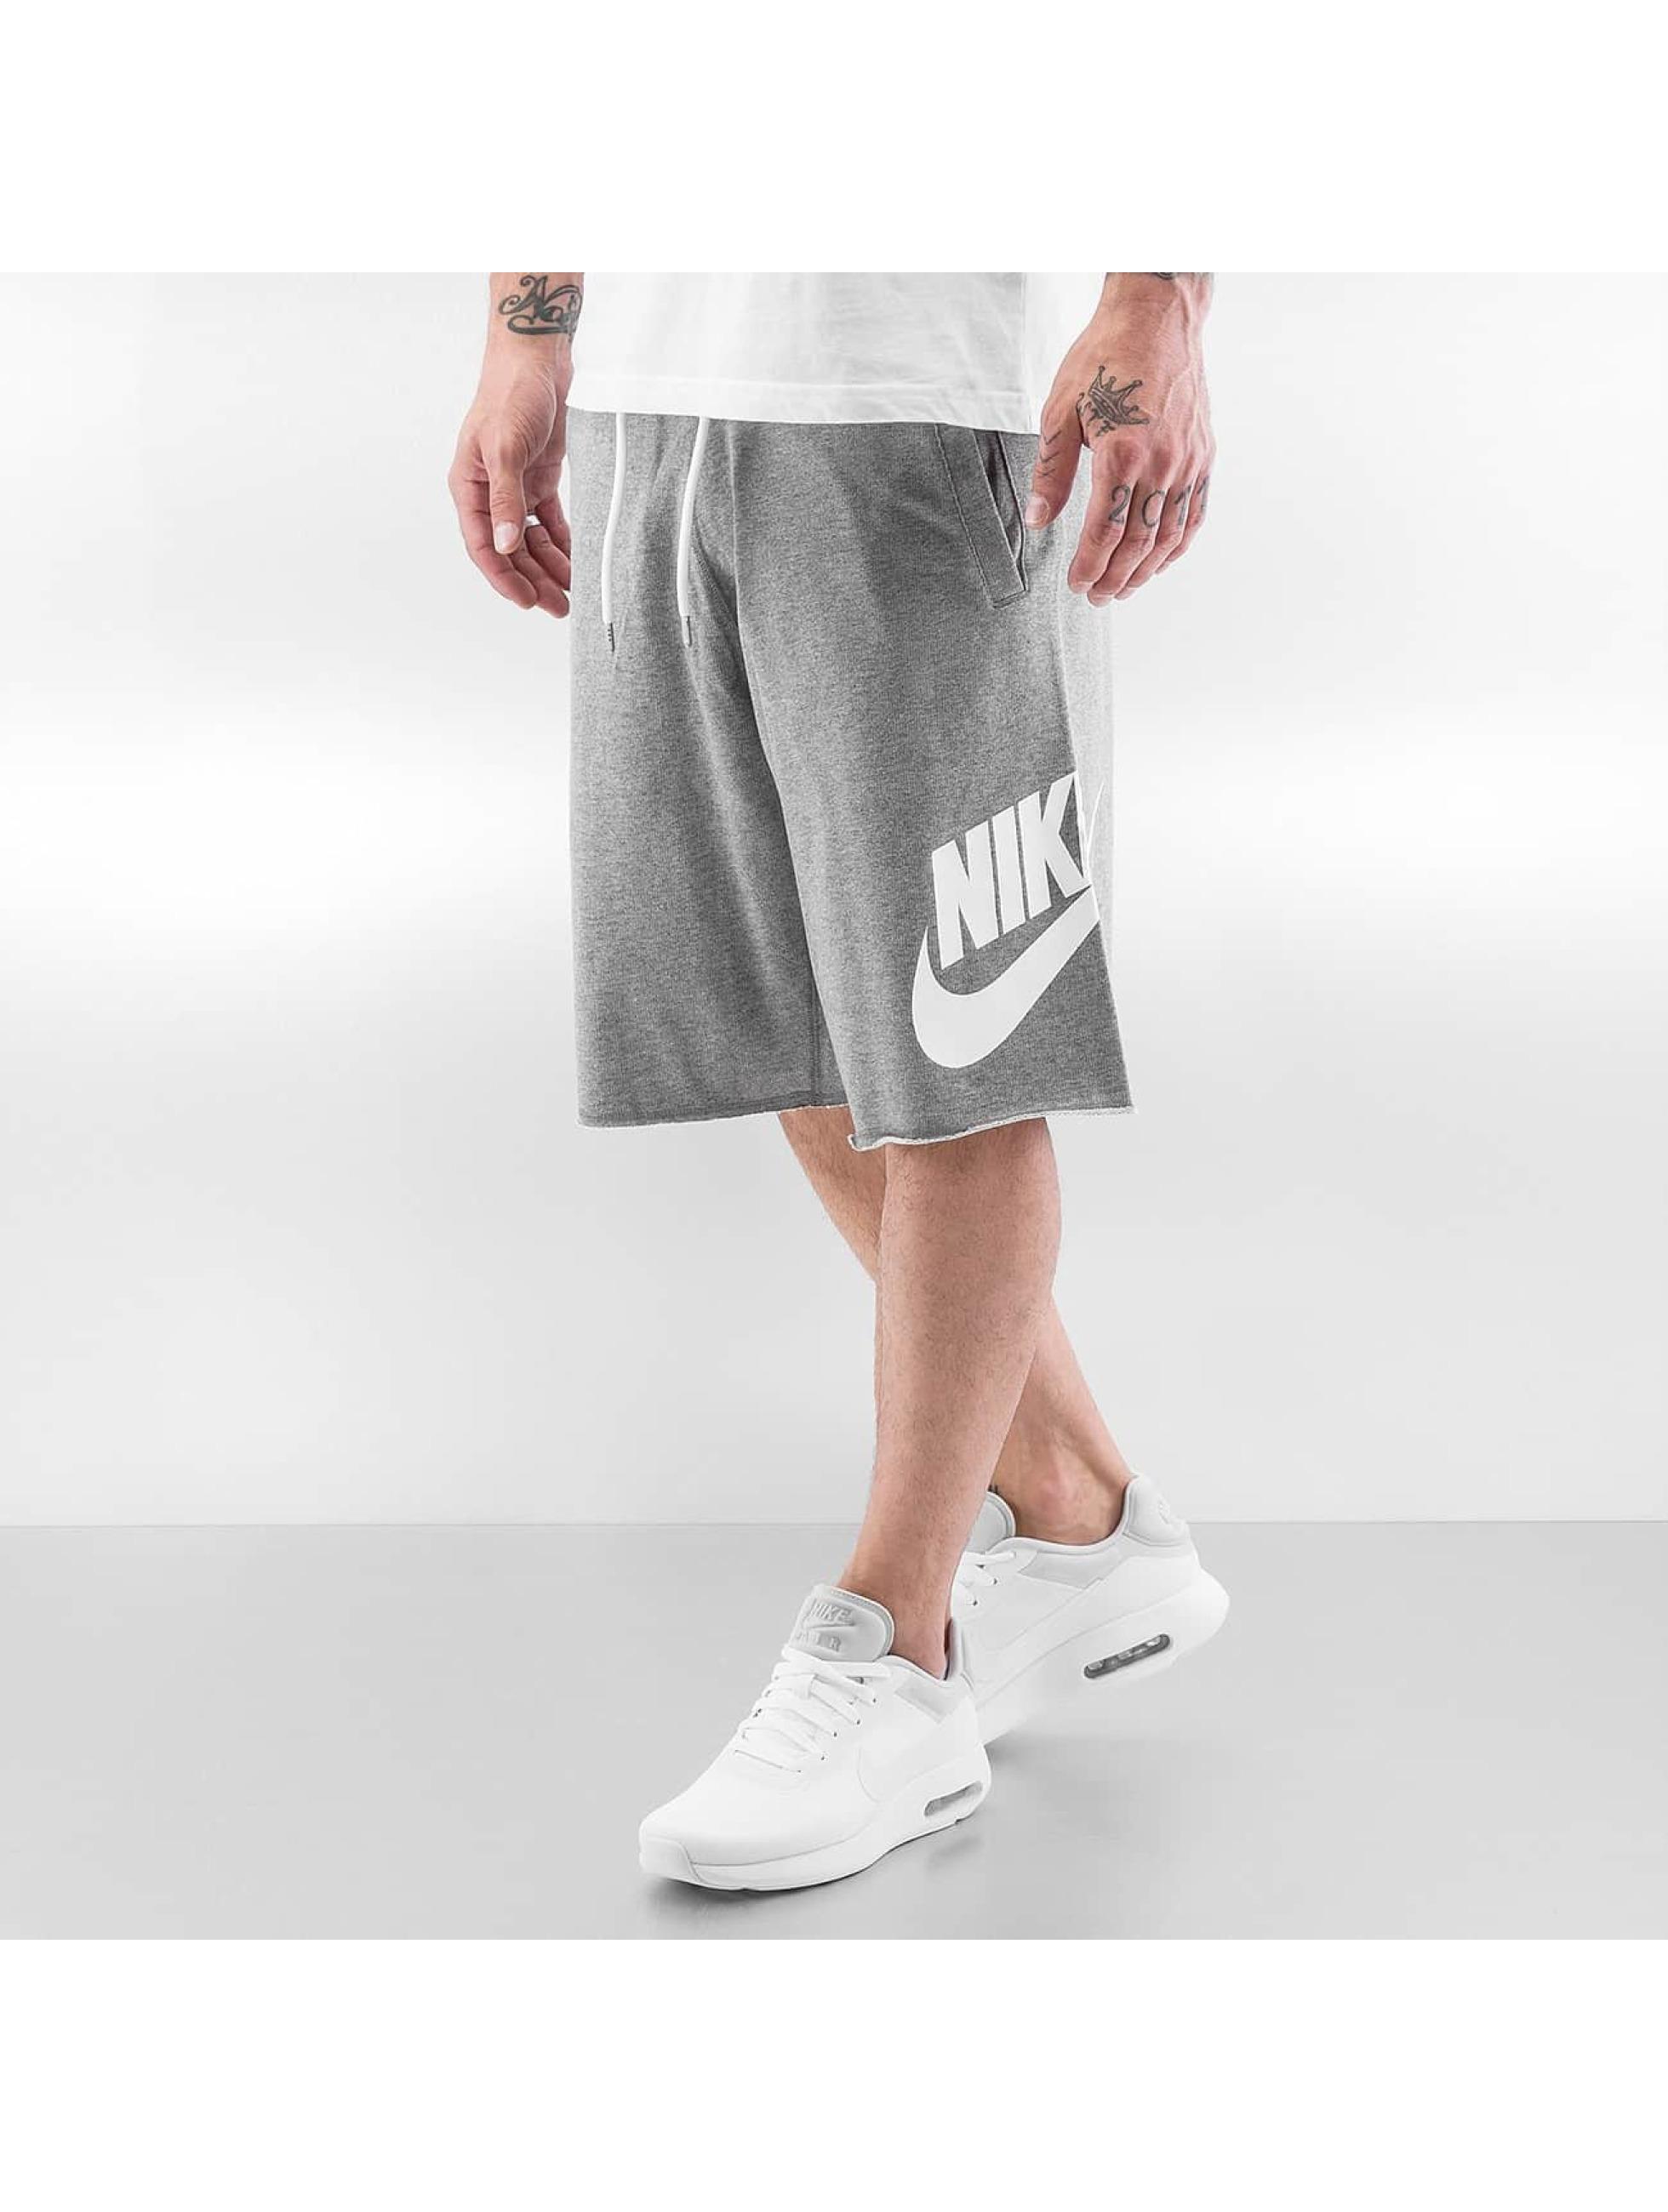 Nike Short NSW FT GX grey